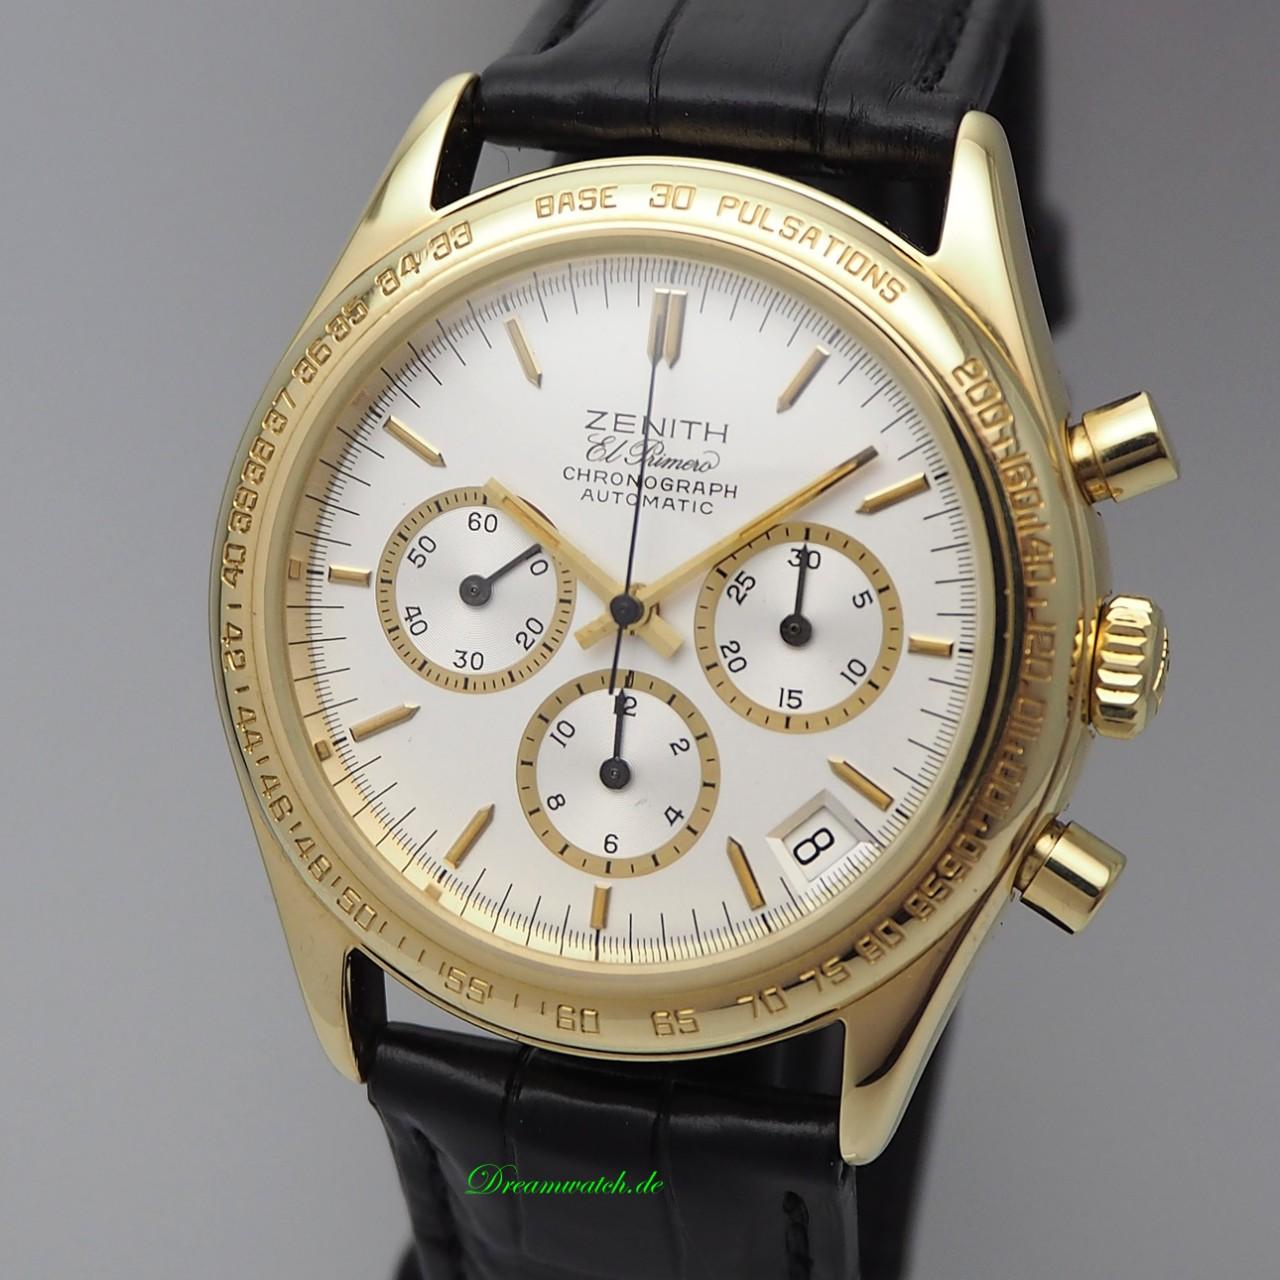 Zenith El Primero Chronograph 18k/750 Gold Pulsmeter/ Pulsations